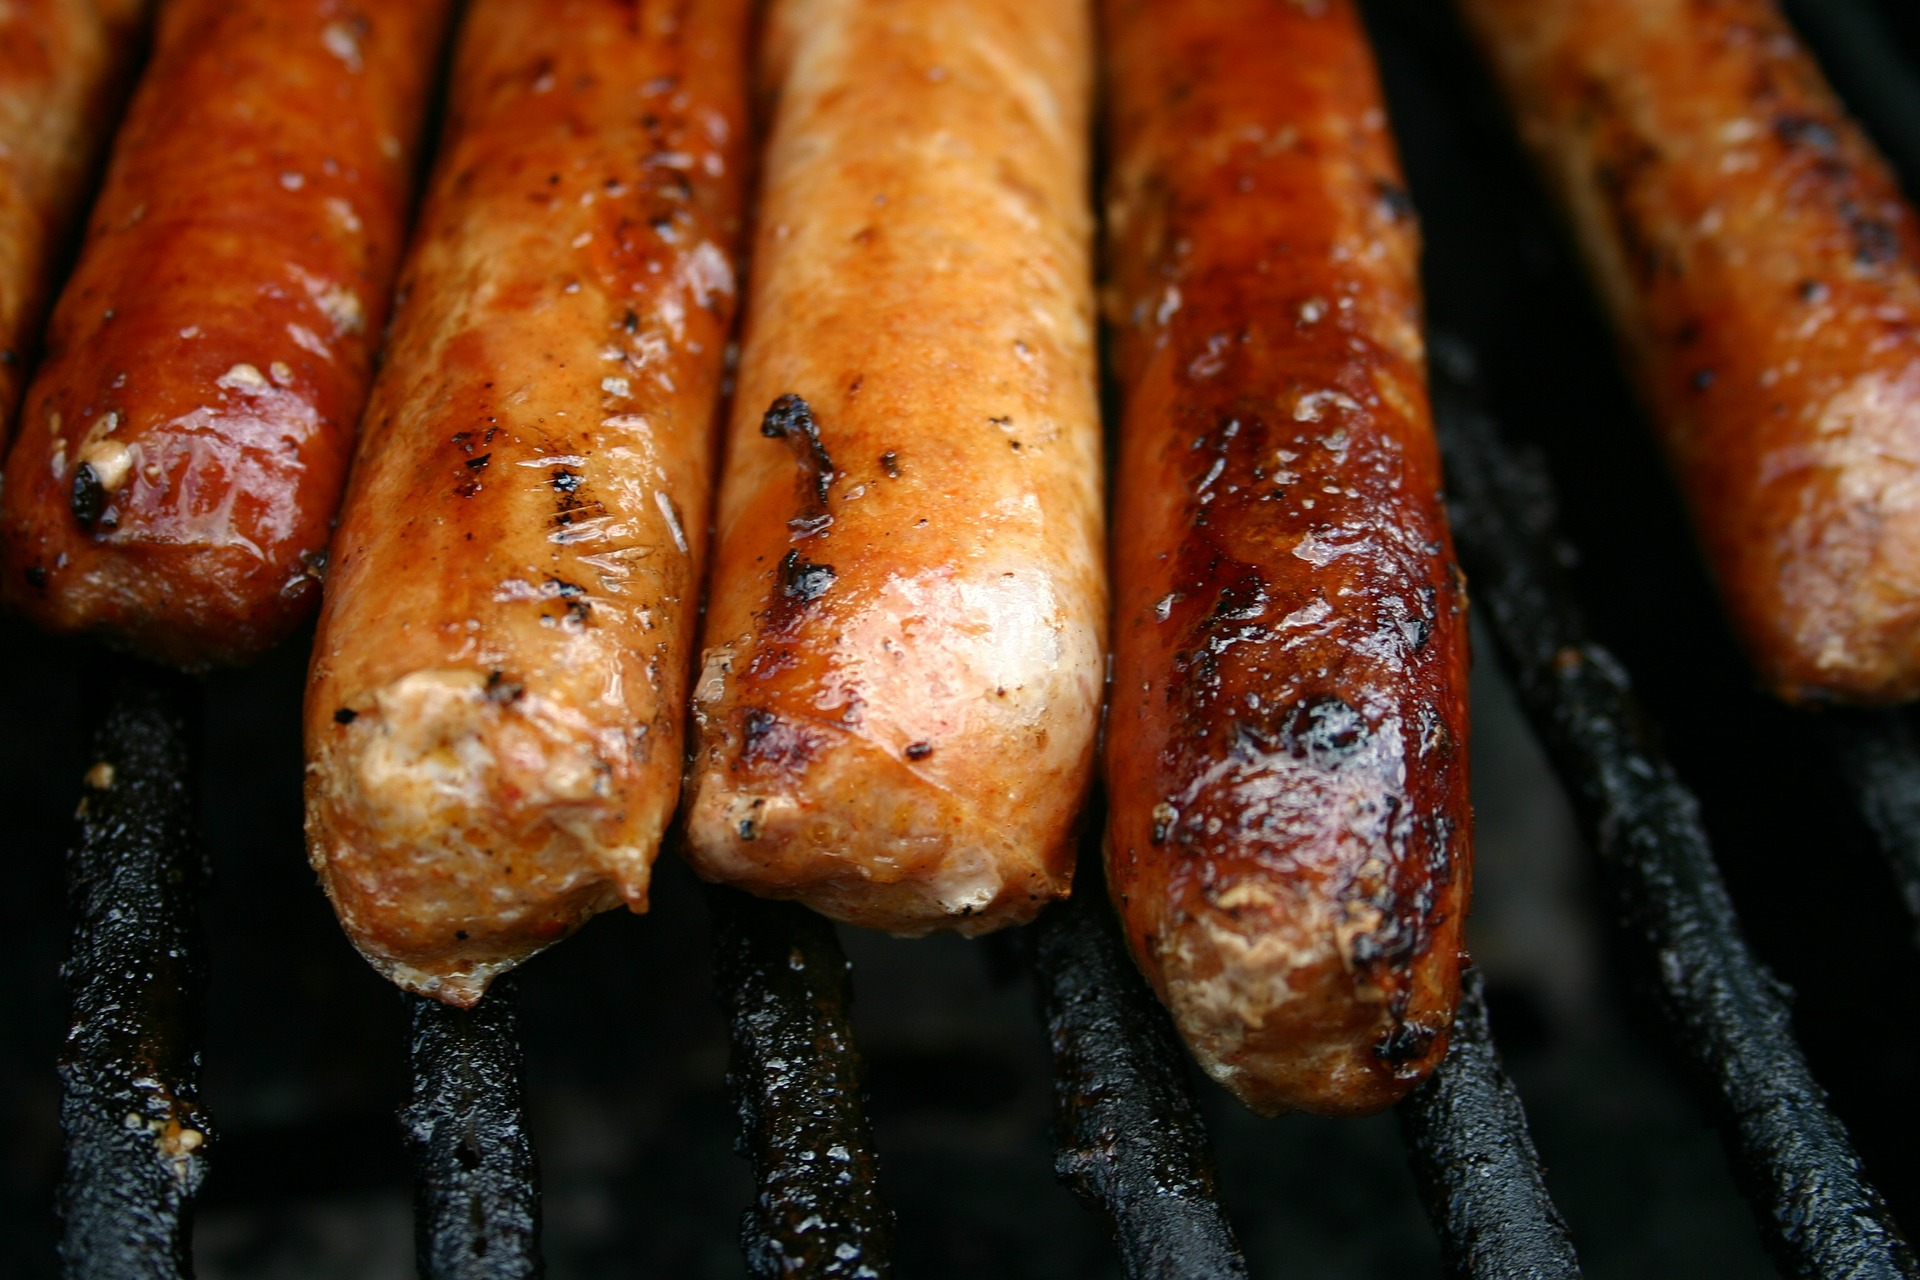 sausages-549330_1920.jpg